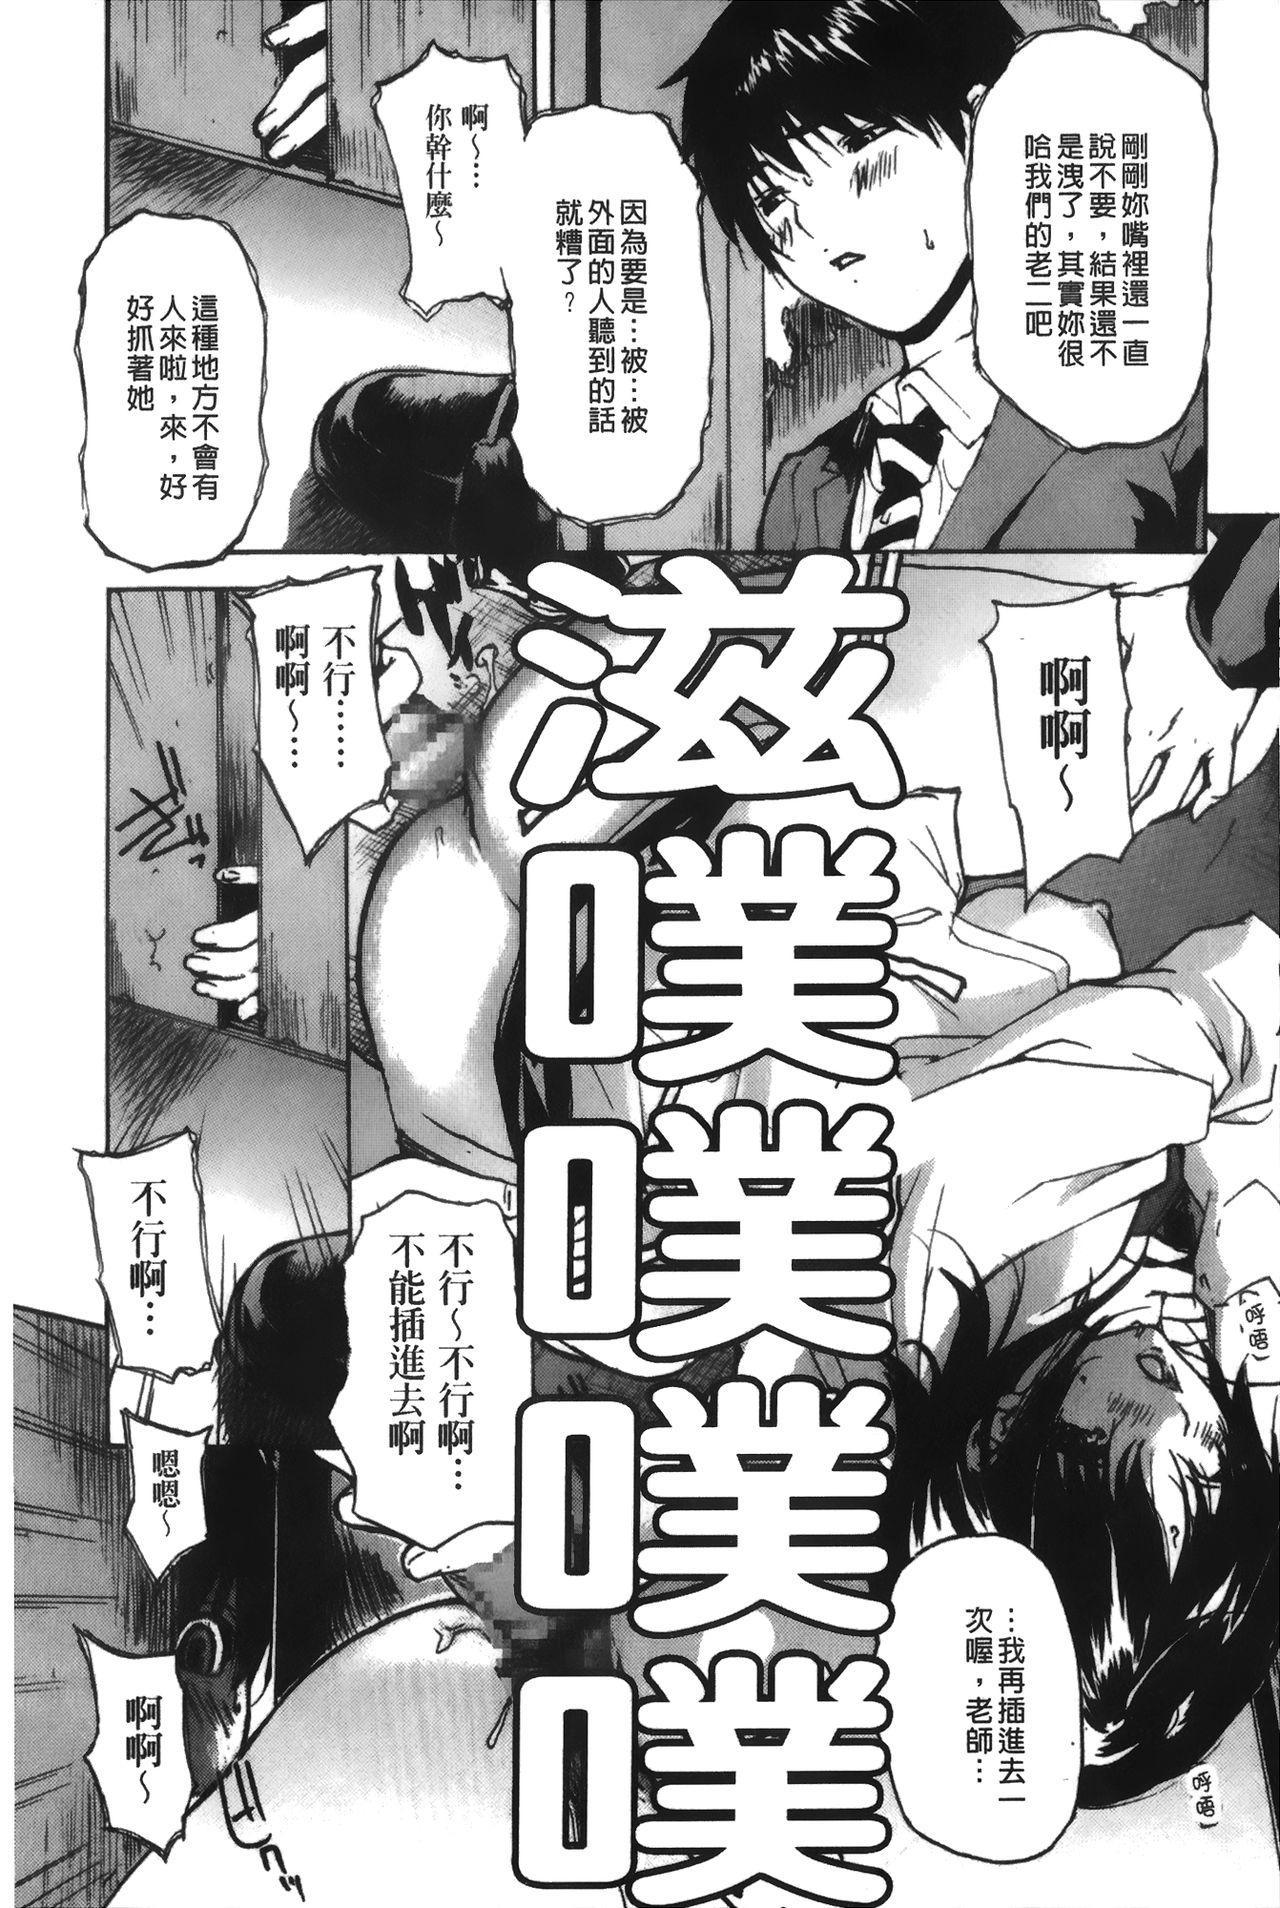 Tonari no Minano Sensei 4 | 隔壁的美奈乃老師 4 77